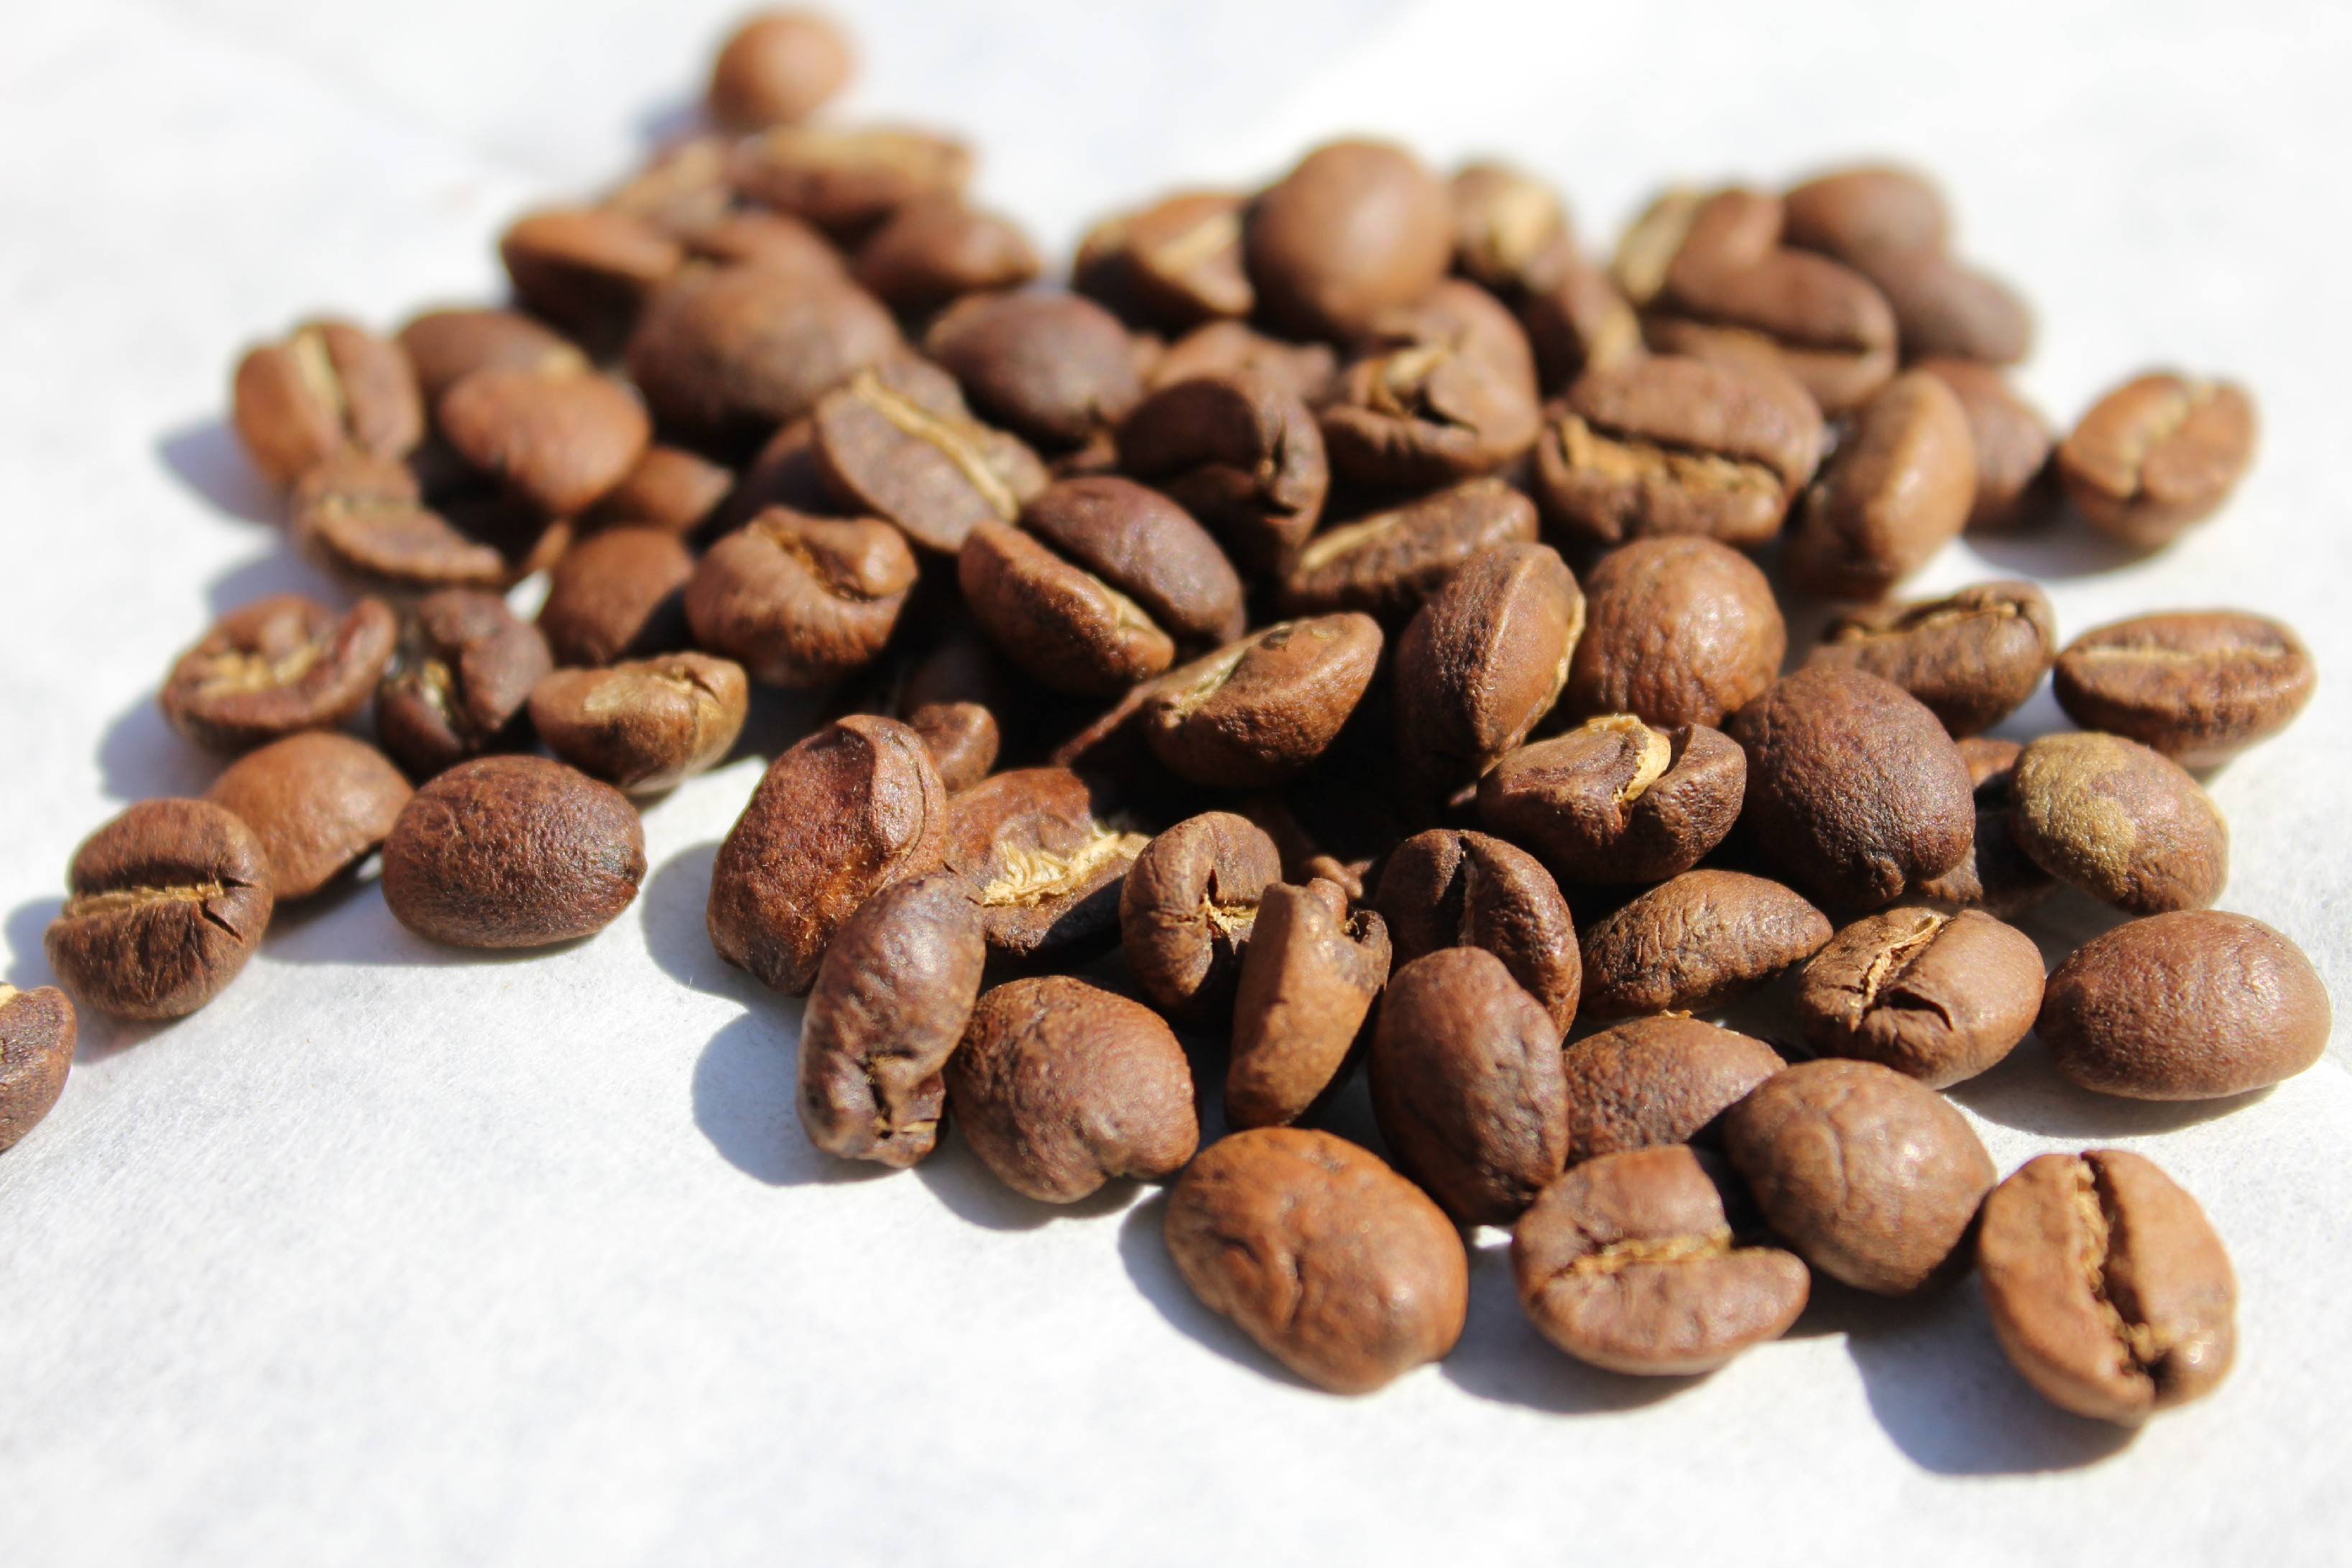 BotaCoffee Tanzania AA Top Songwa Estates (1kg) Mletí kávy: Zrnková